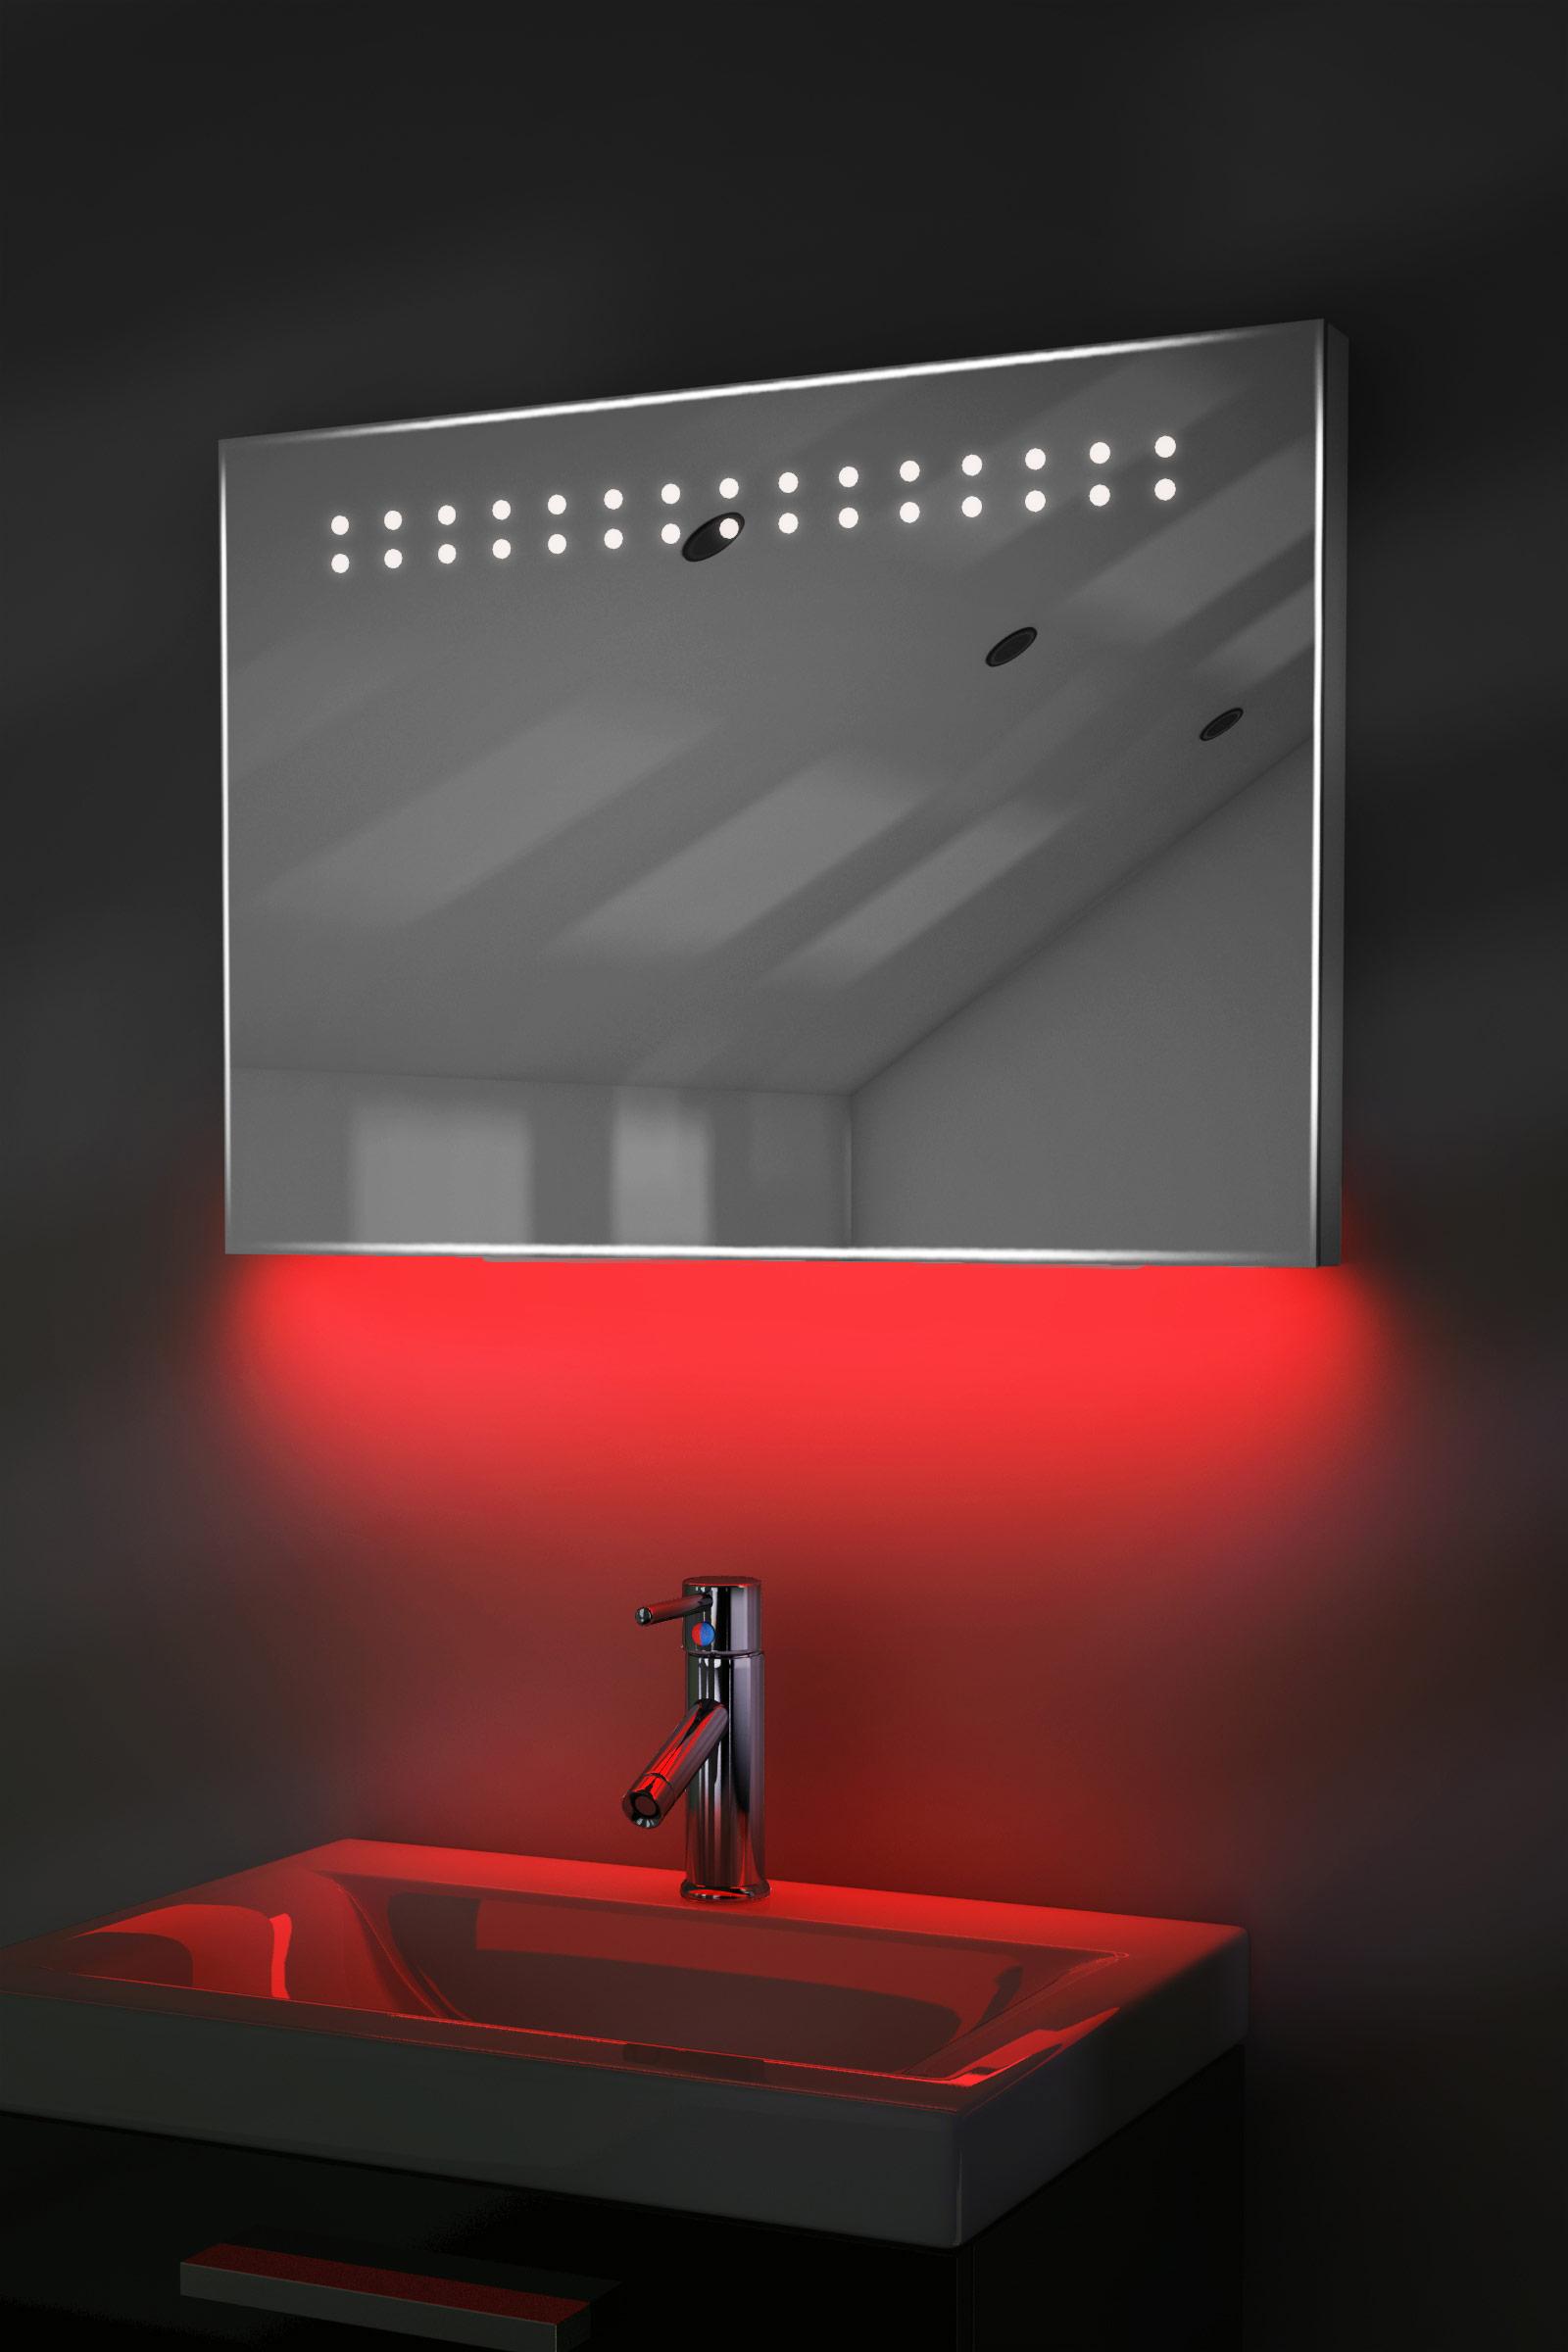 Bathroom Mirrors Illuminated: Ambient Shaver LED Bathroom Illuminated Mirror With